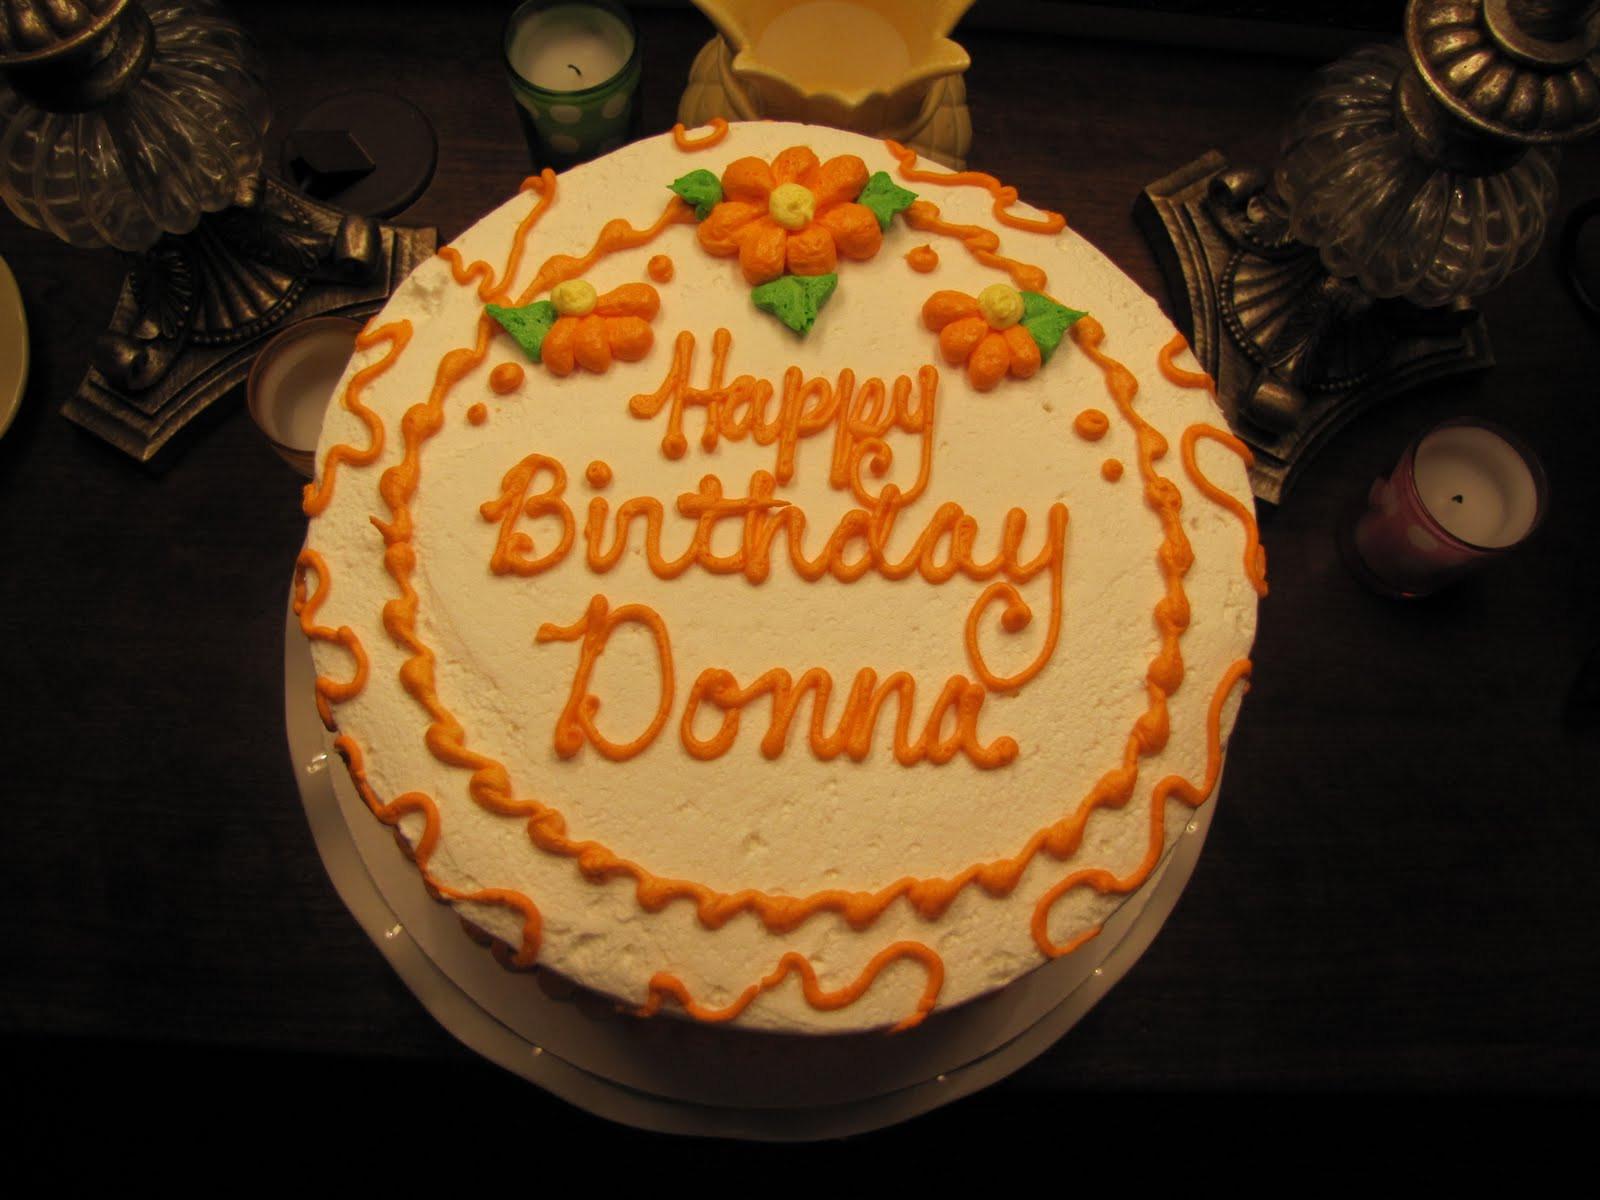 Best ideas about Happy Birthday Donna Cake . Save or Pin All About The Armes Happy Birthday Donna Now.